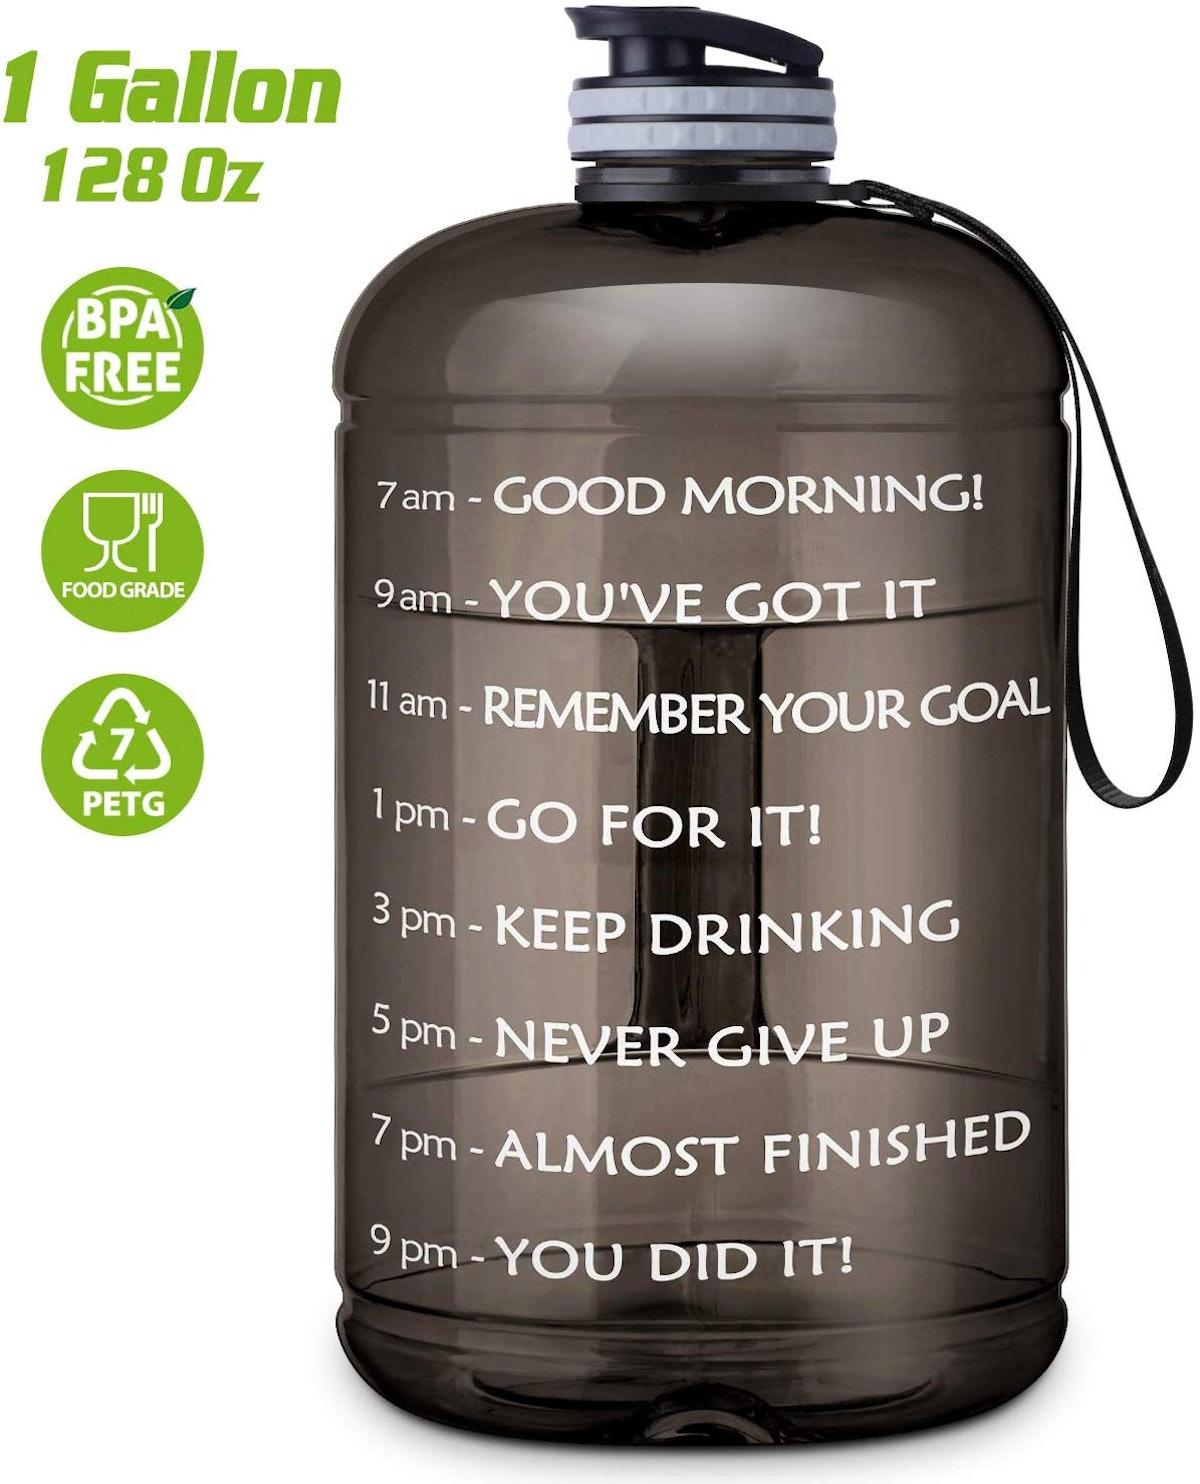 Portable Gallon Water Jug